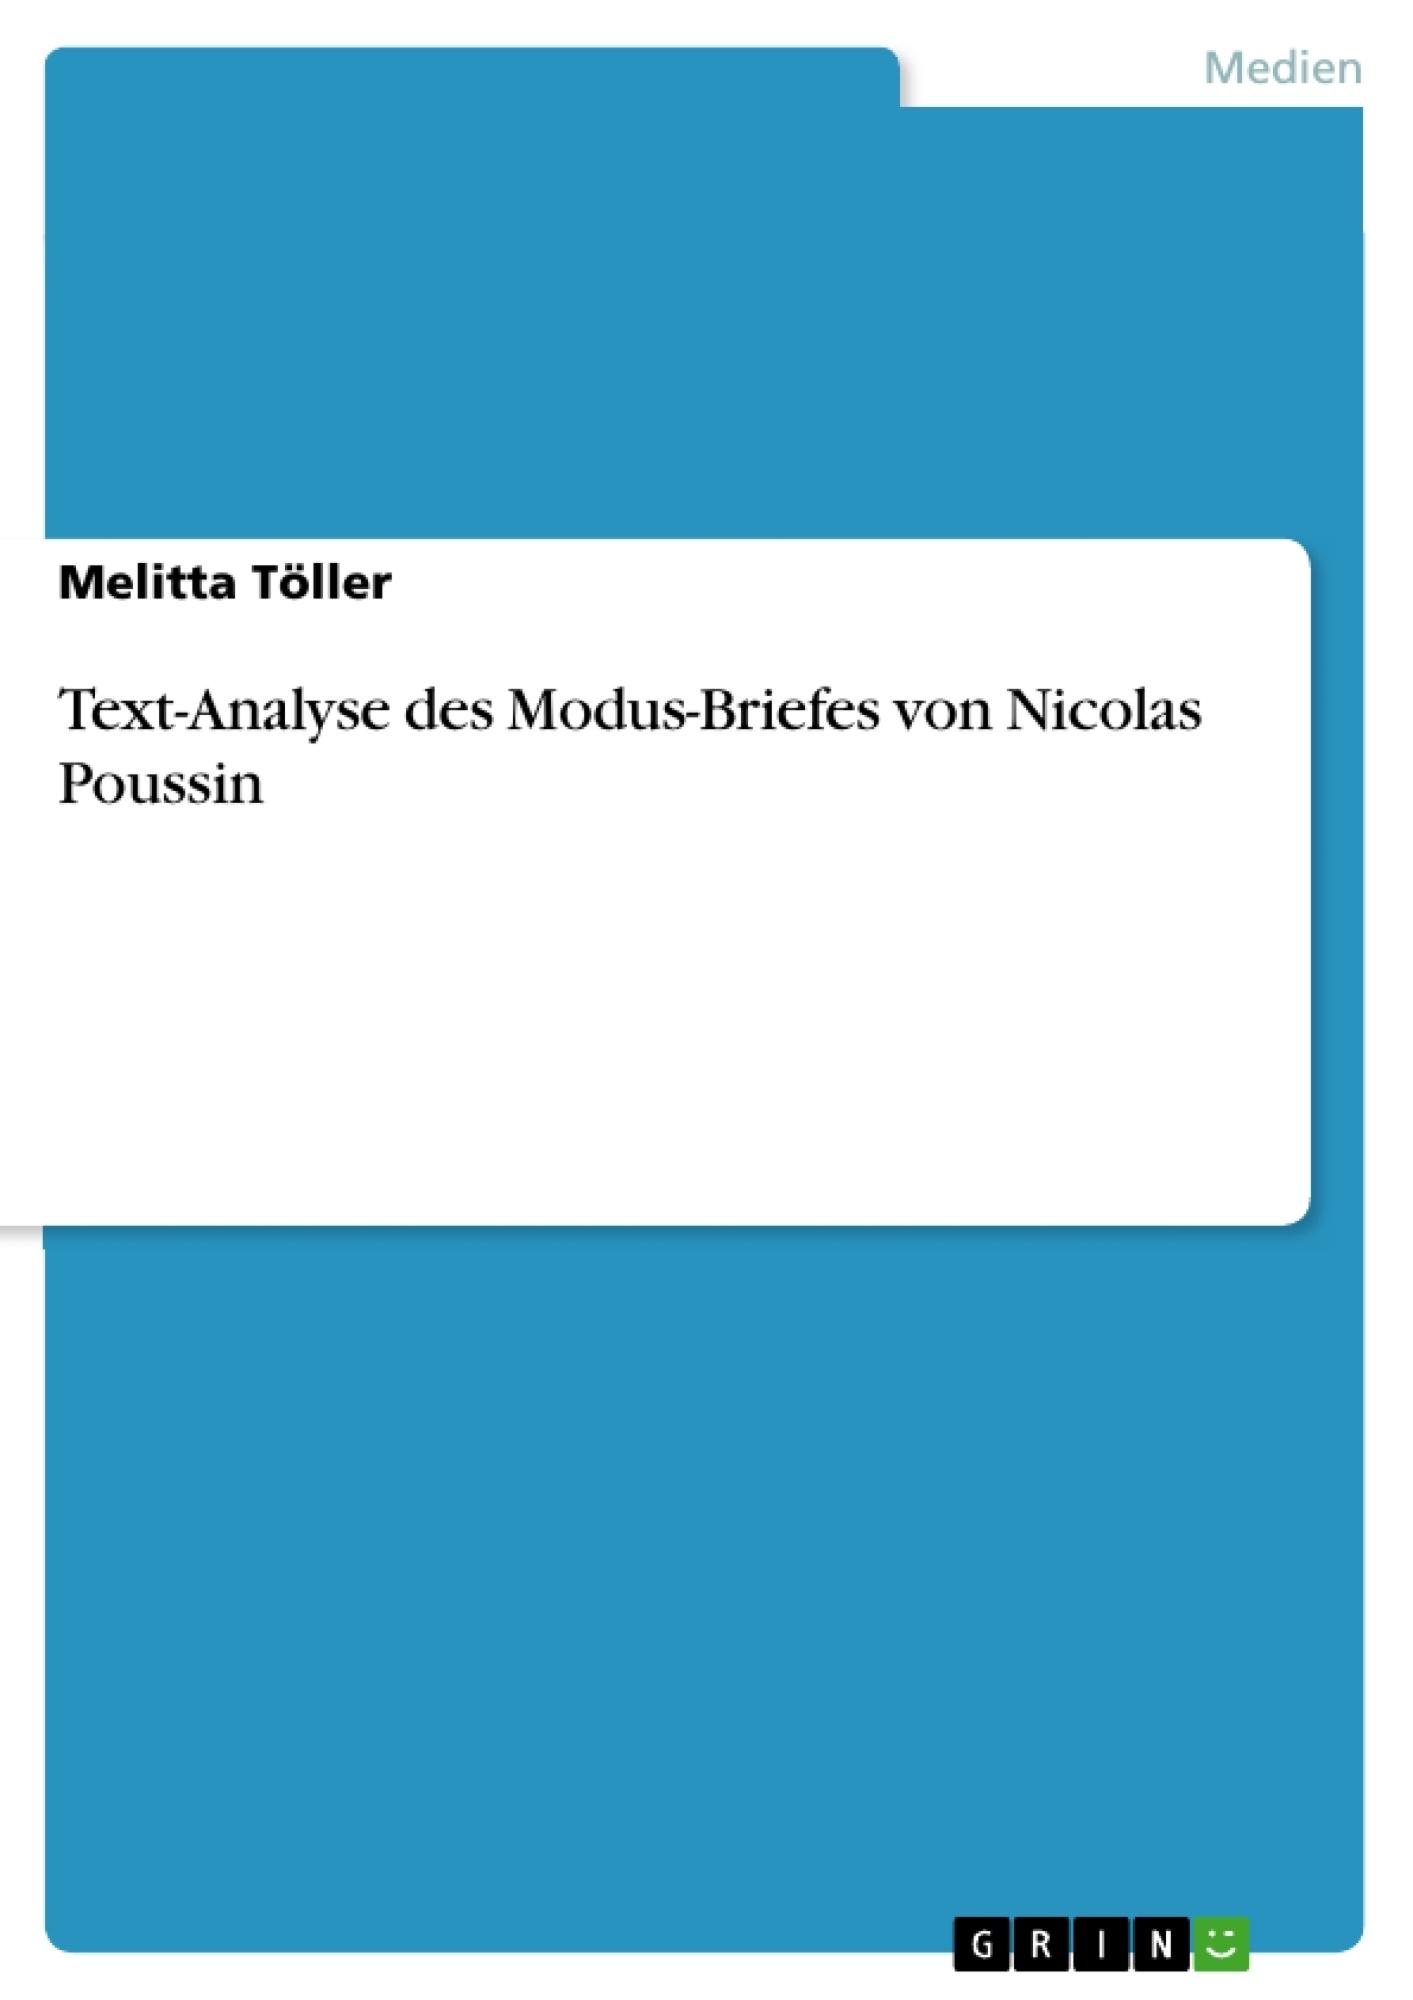 Titel: Text-Analyse des Modus-Briefes von Nicolas Poussin